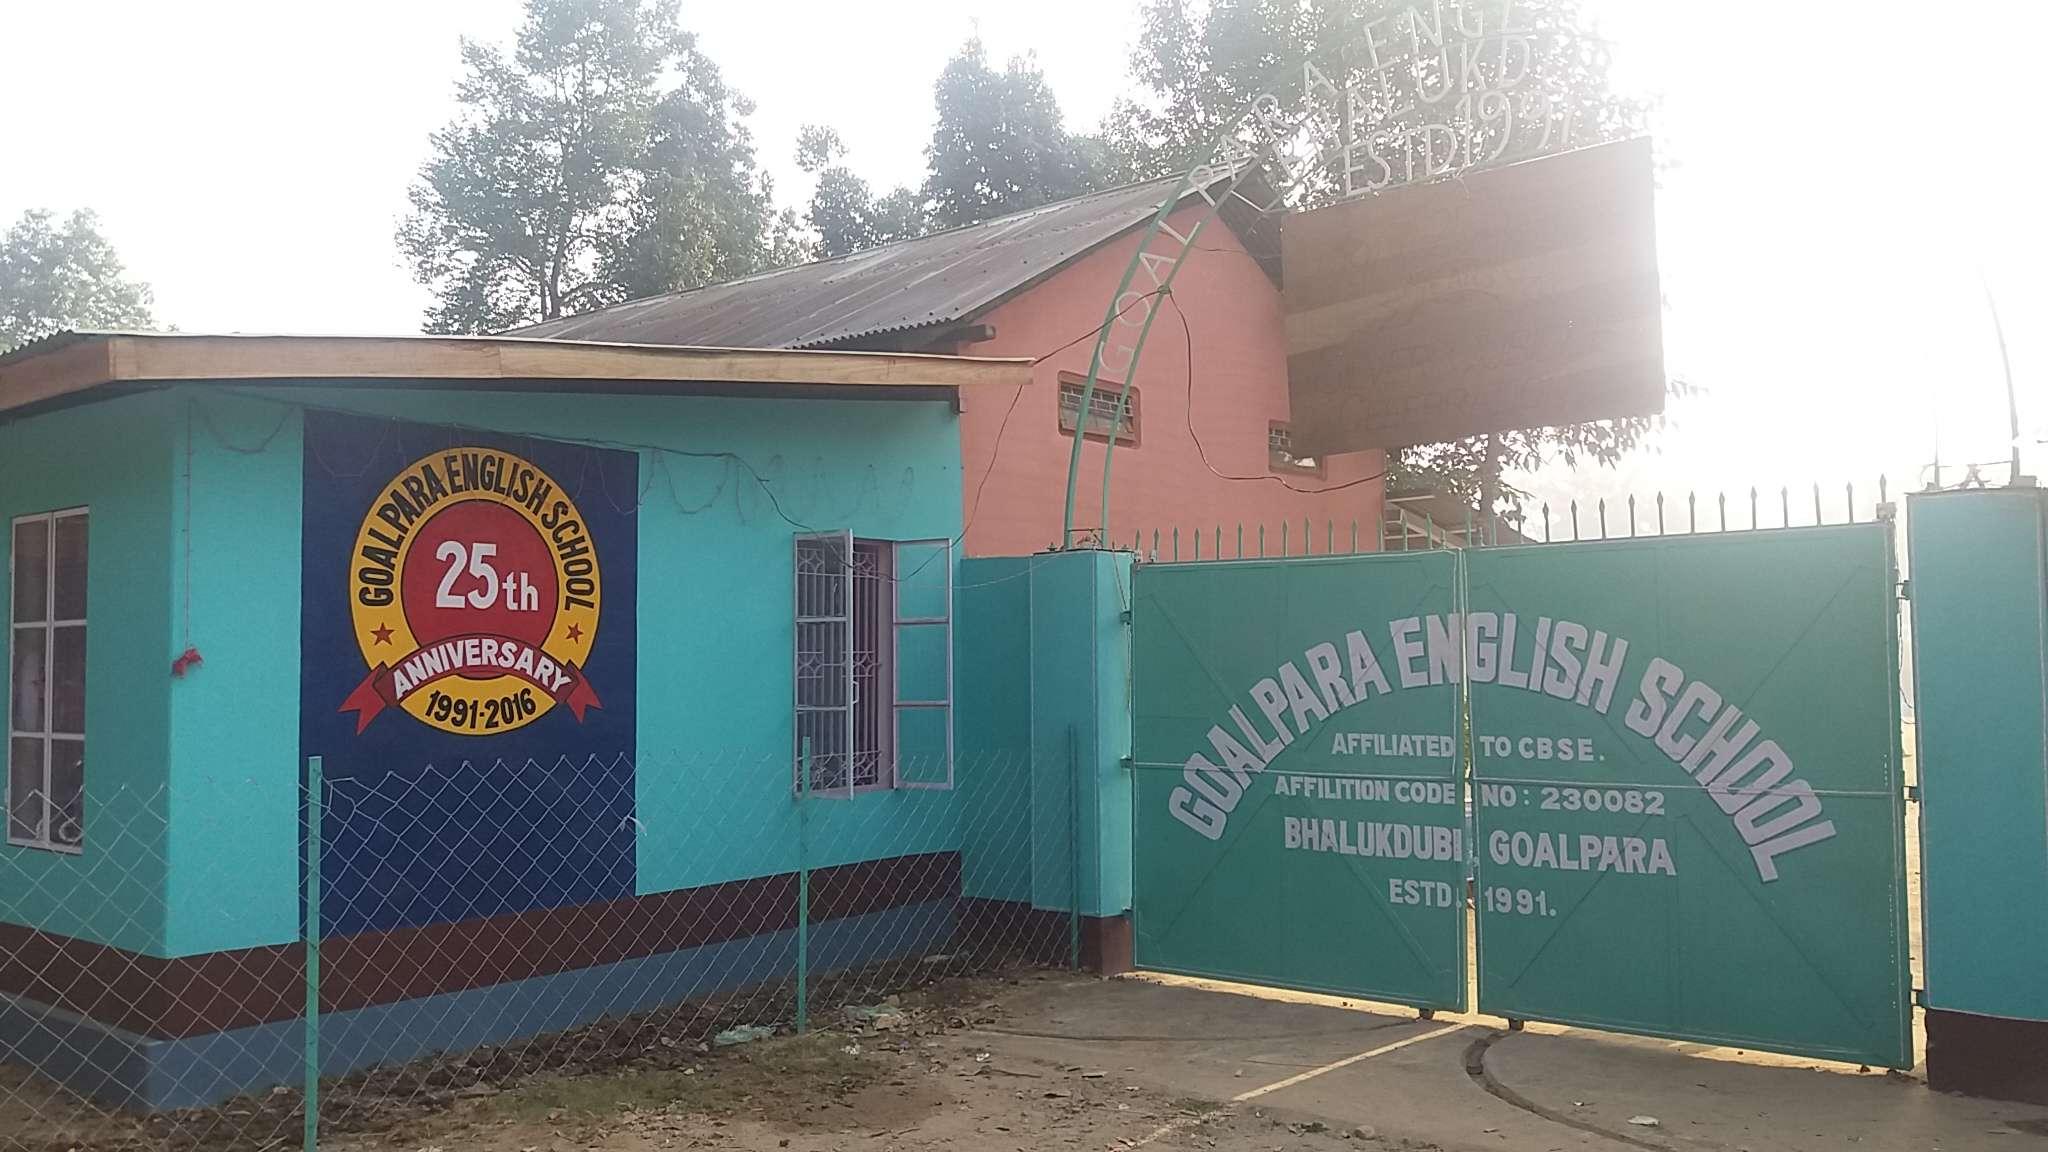 GOALPARA ENGLISH SCHOOL PO BHALUKDUBI TEHSIL BALIJANA DISTT GOALPARA 230082